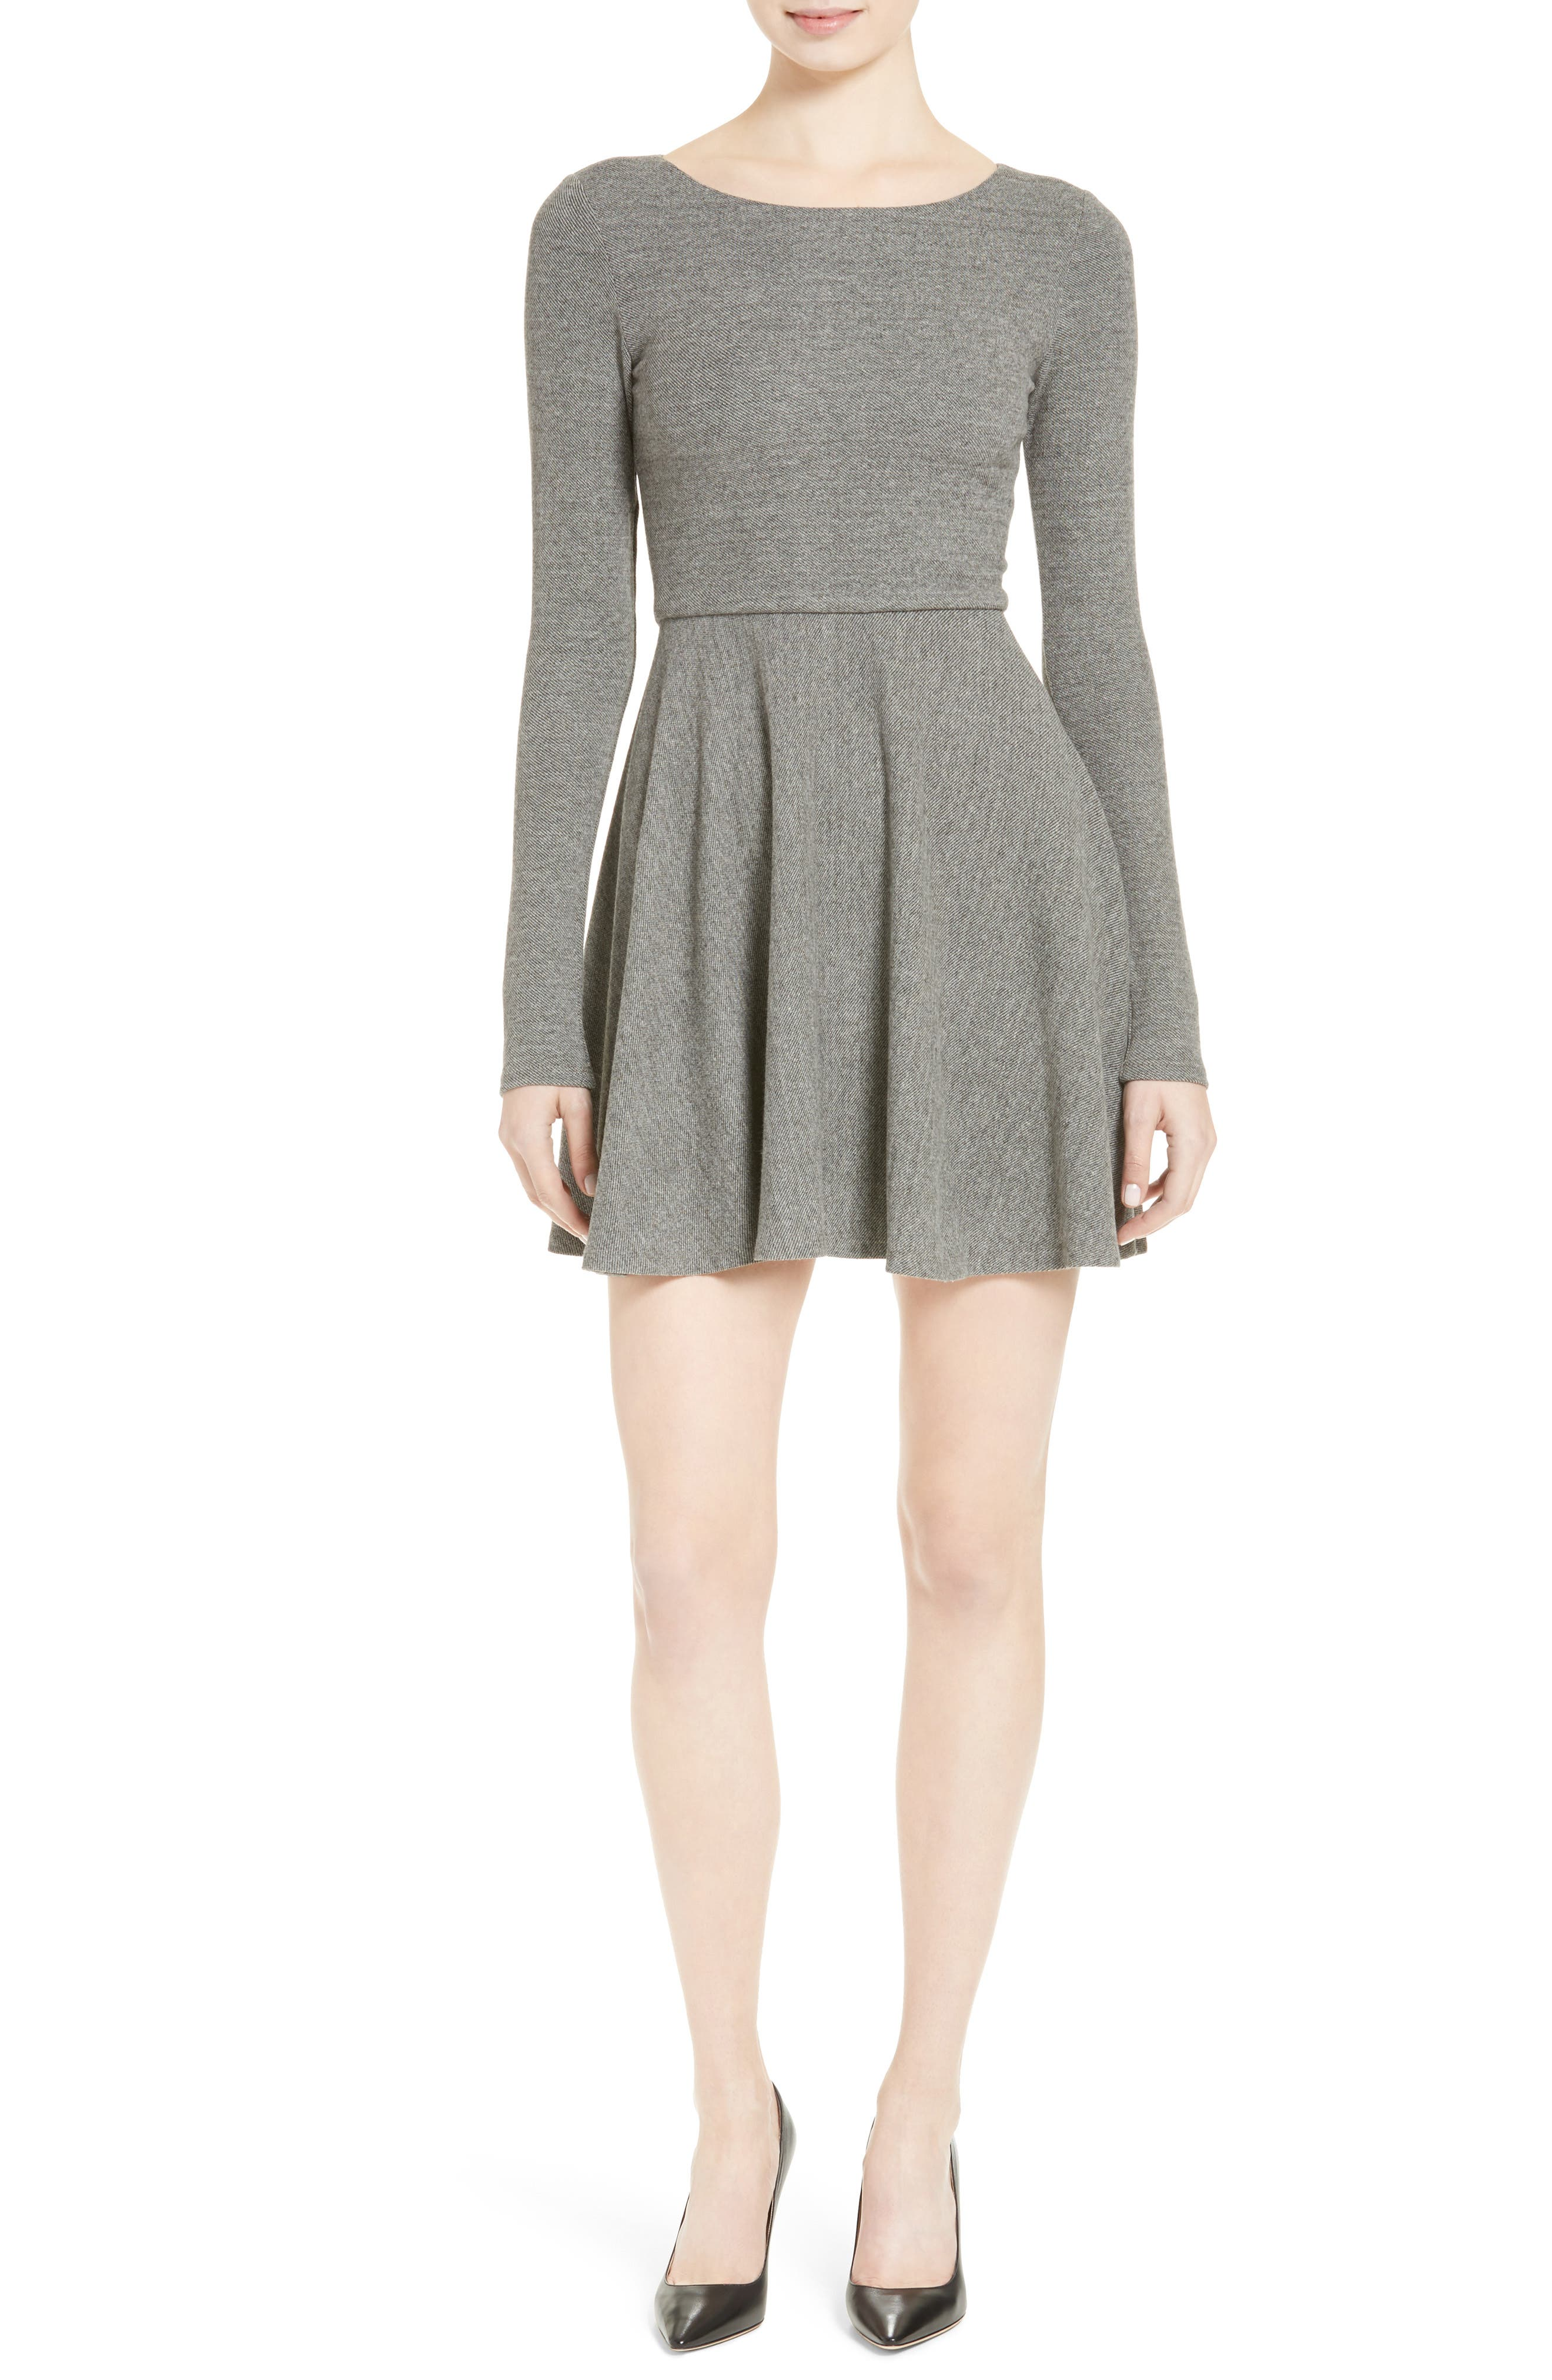 Main Image - Alice + Olivia 'Brinley' Long Sleeve Mini Dress